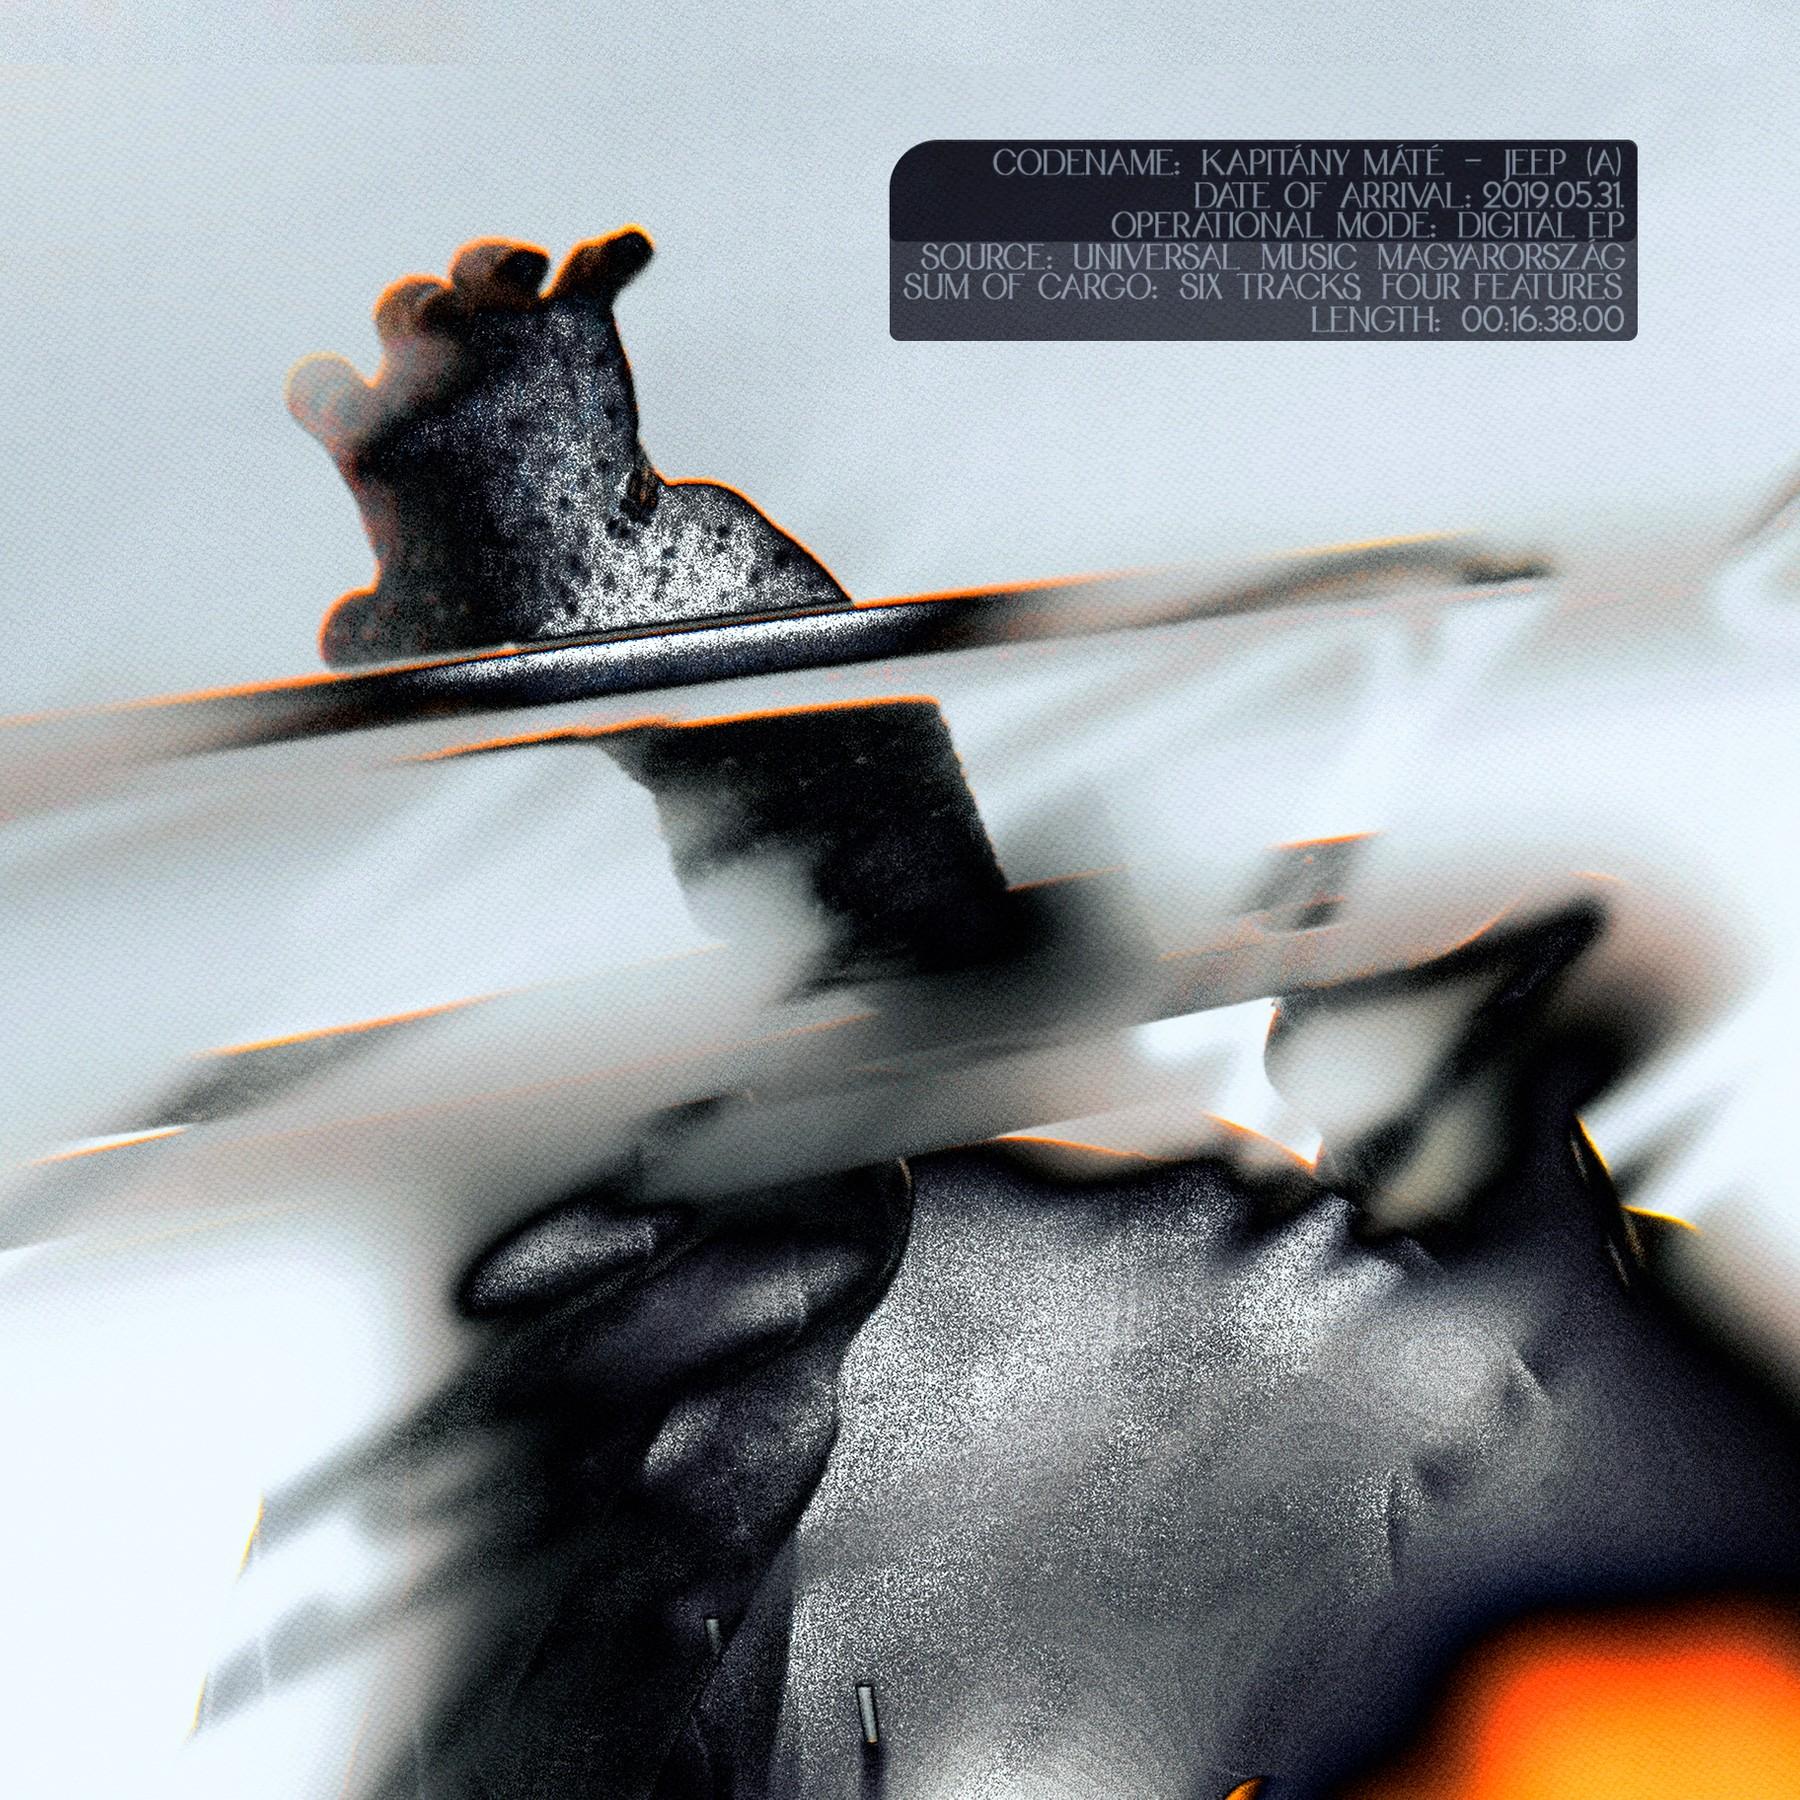 Kapitány Máté - Jeep EP cover (2019) - Nufolklore